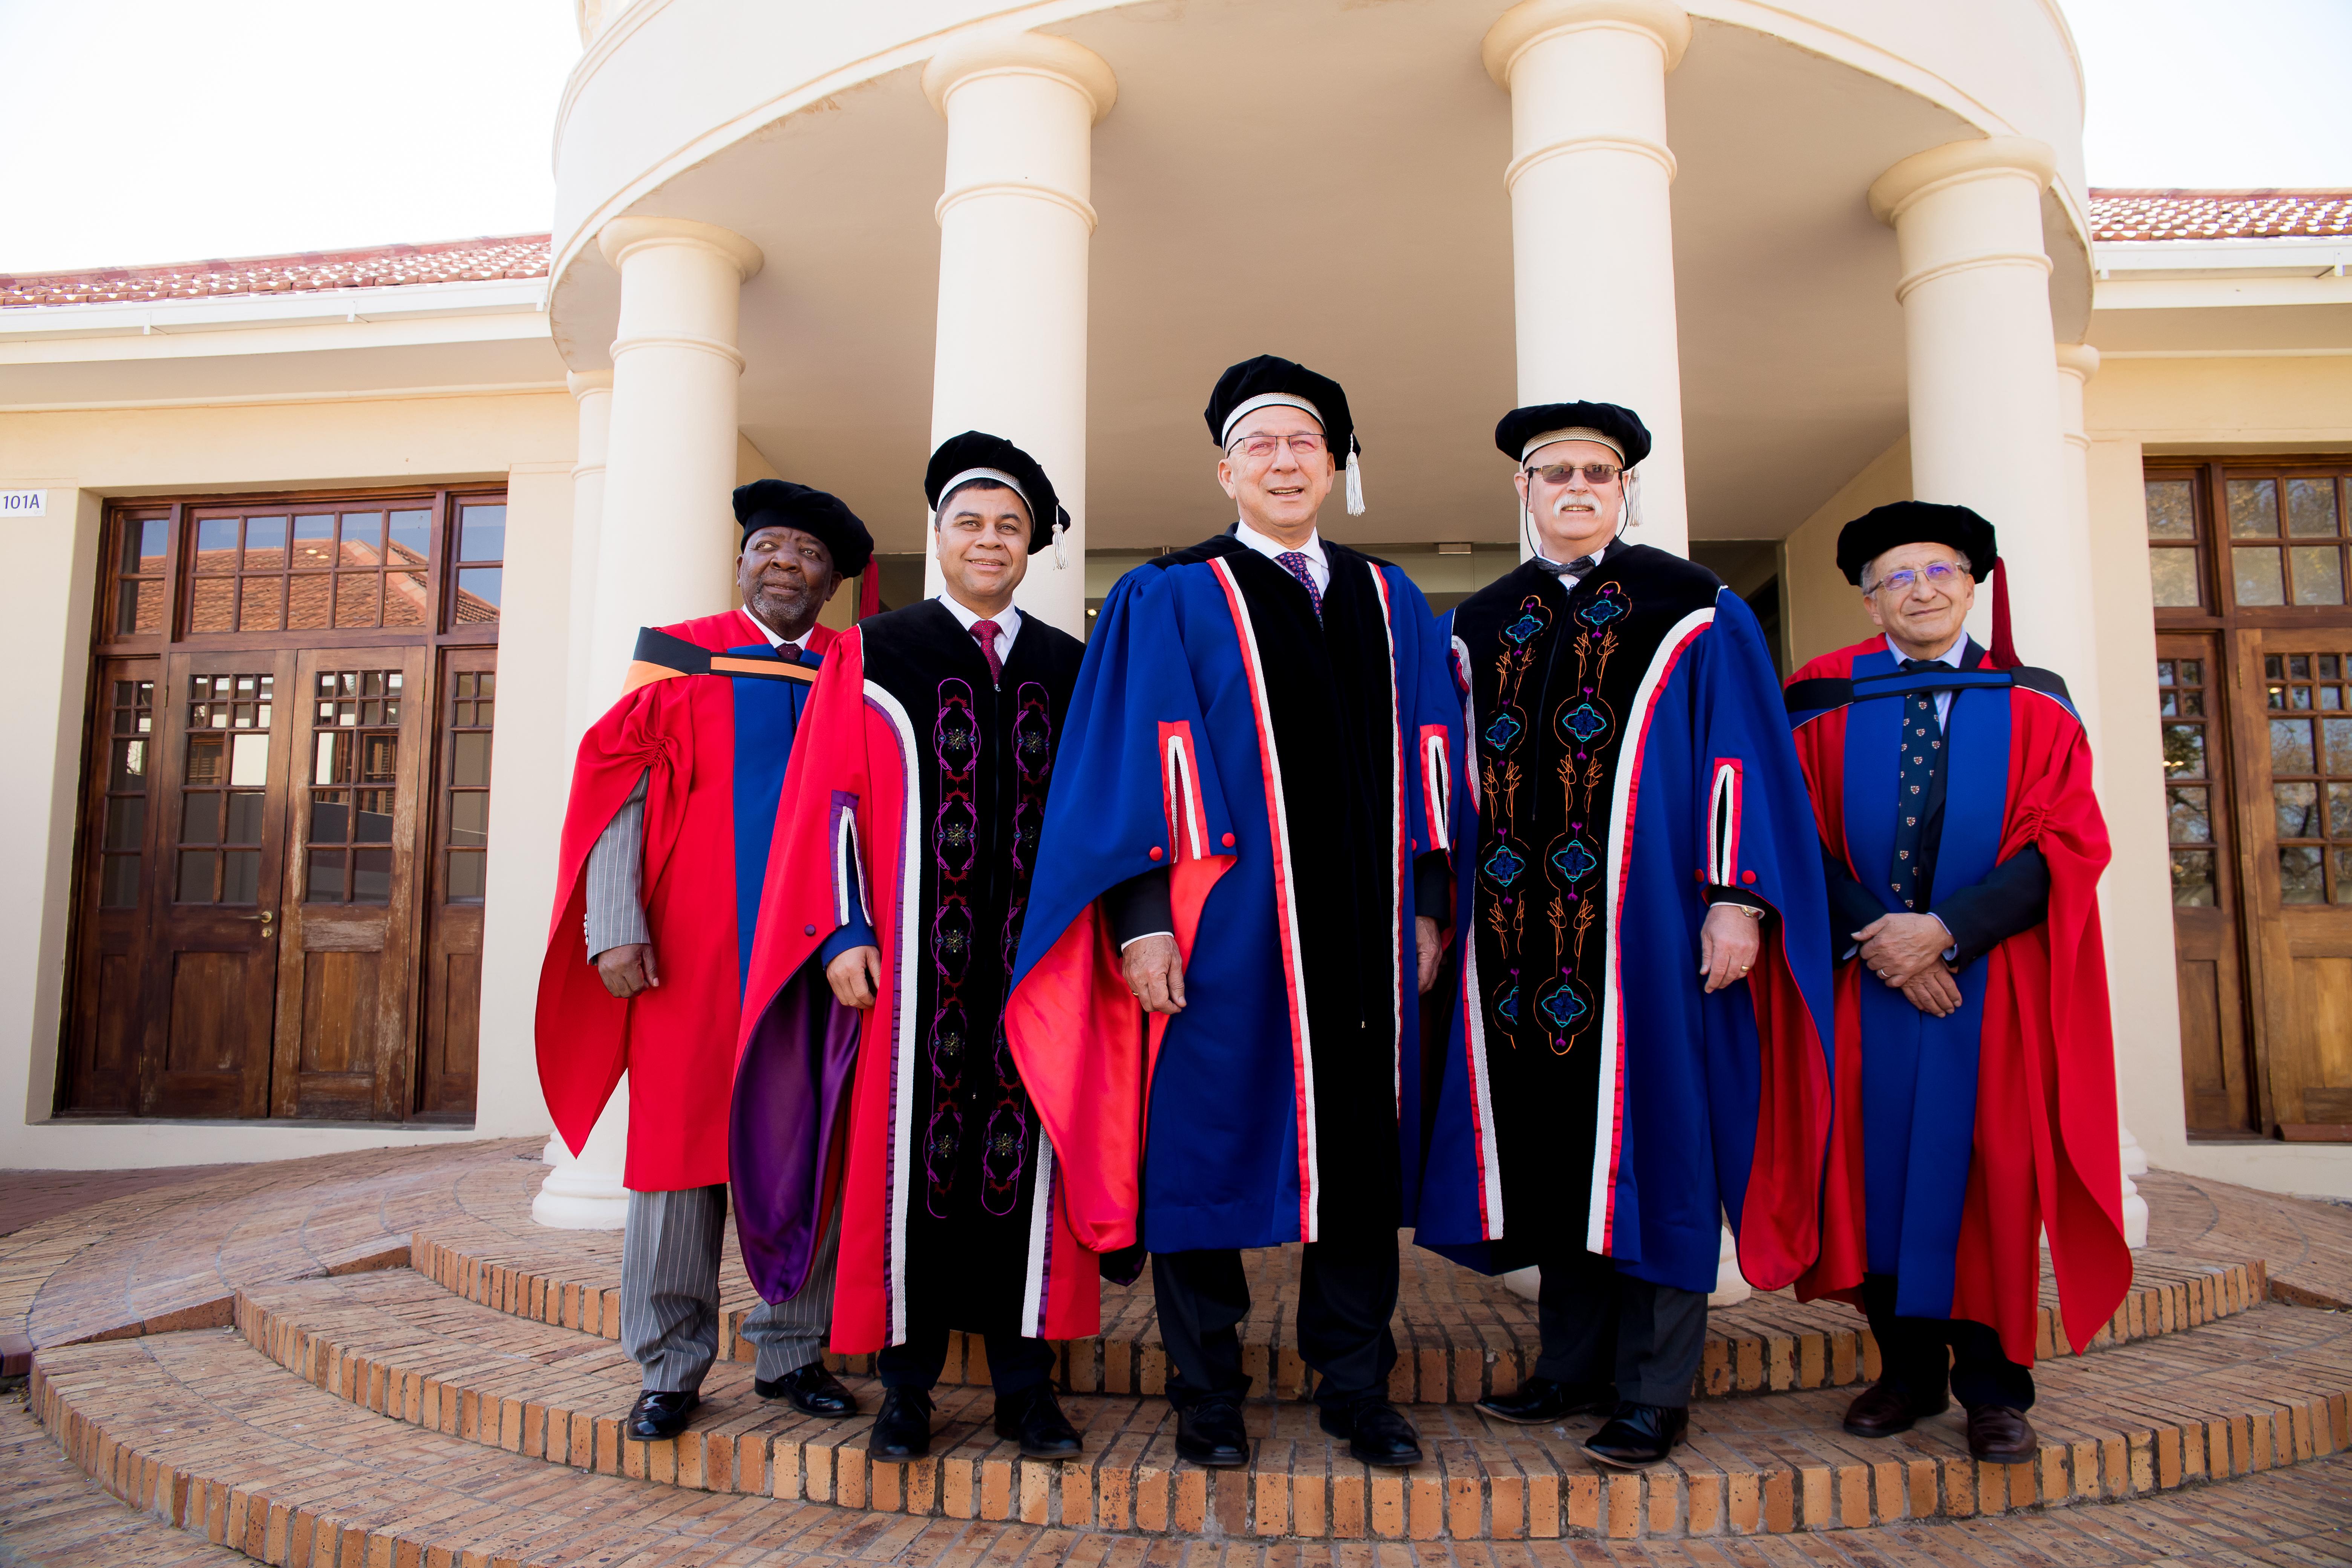 Dr Jerry Mofokeng Wa Makhetha, Prof Francis Petersen, Dr Trevor Manuel, Mr Willem Louw and Dr Bernard Fanaroff